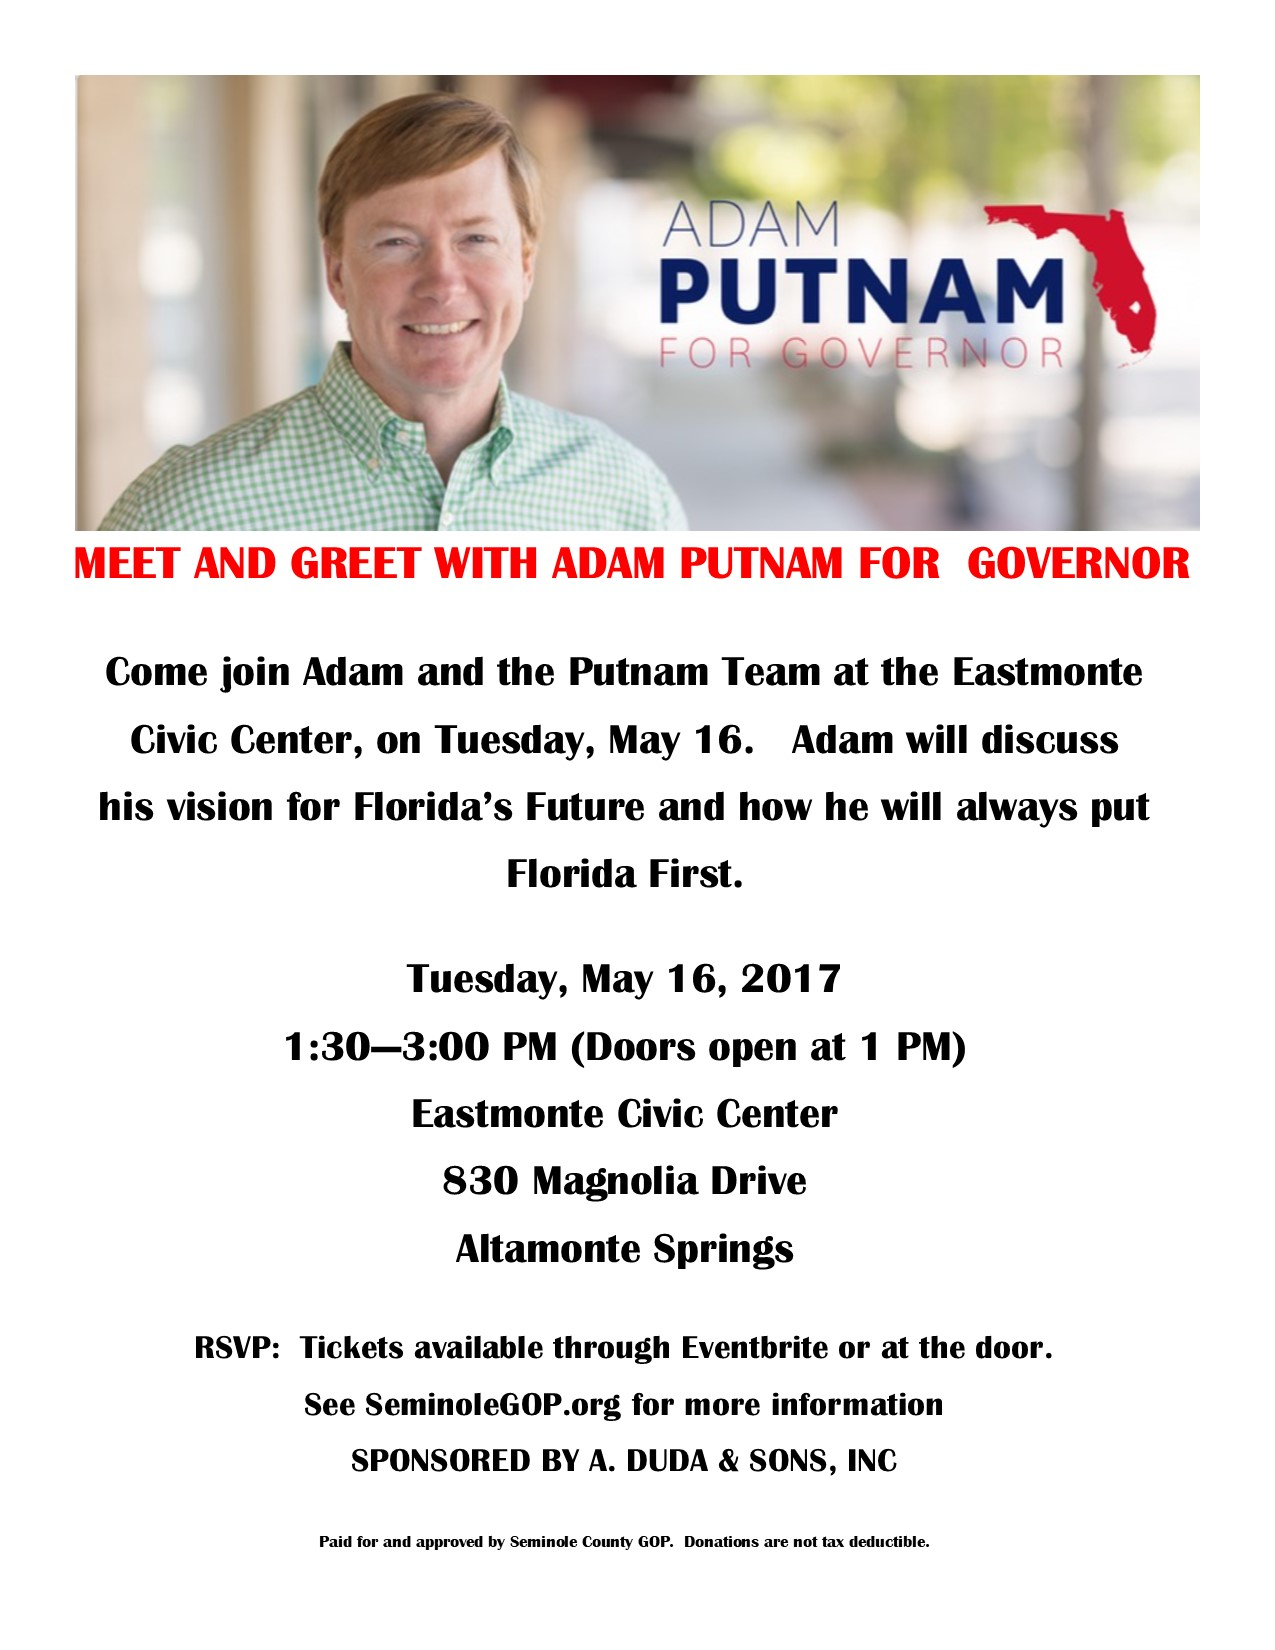 Adam Putnam Seminole County Gop To Host Altamonte Springs Meet And